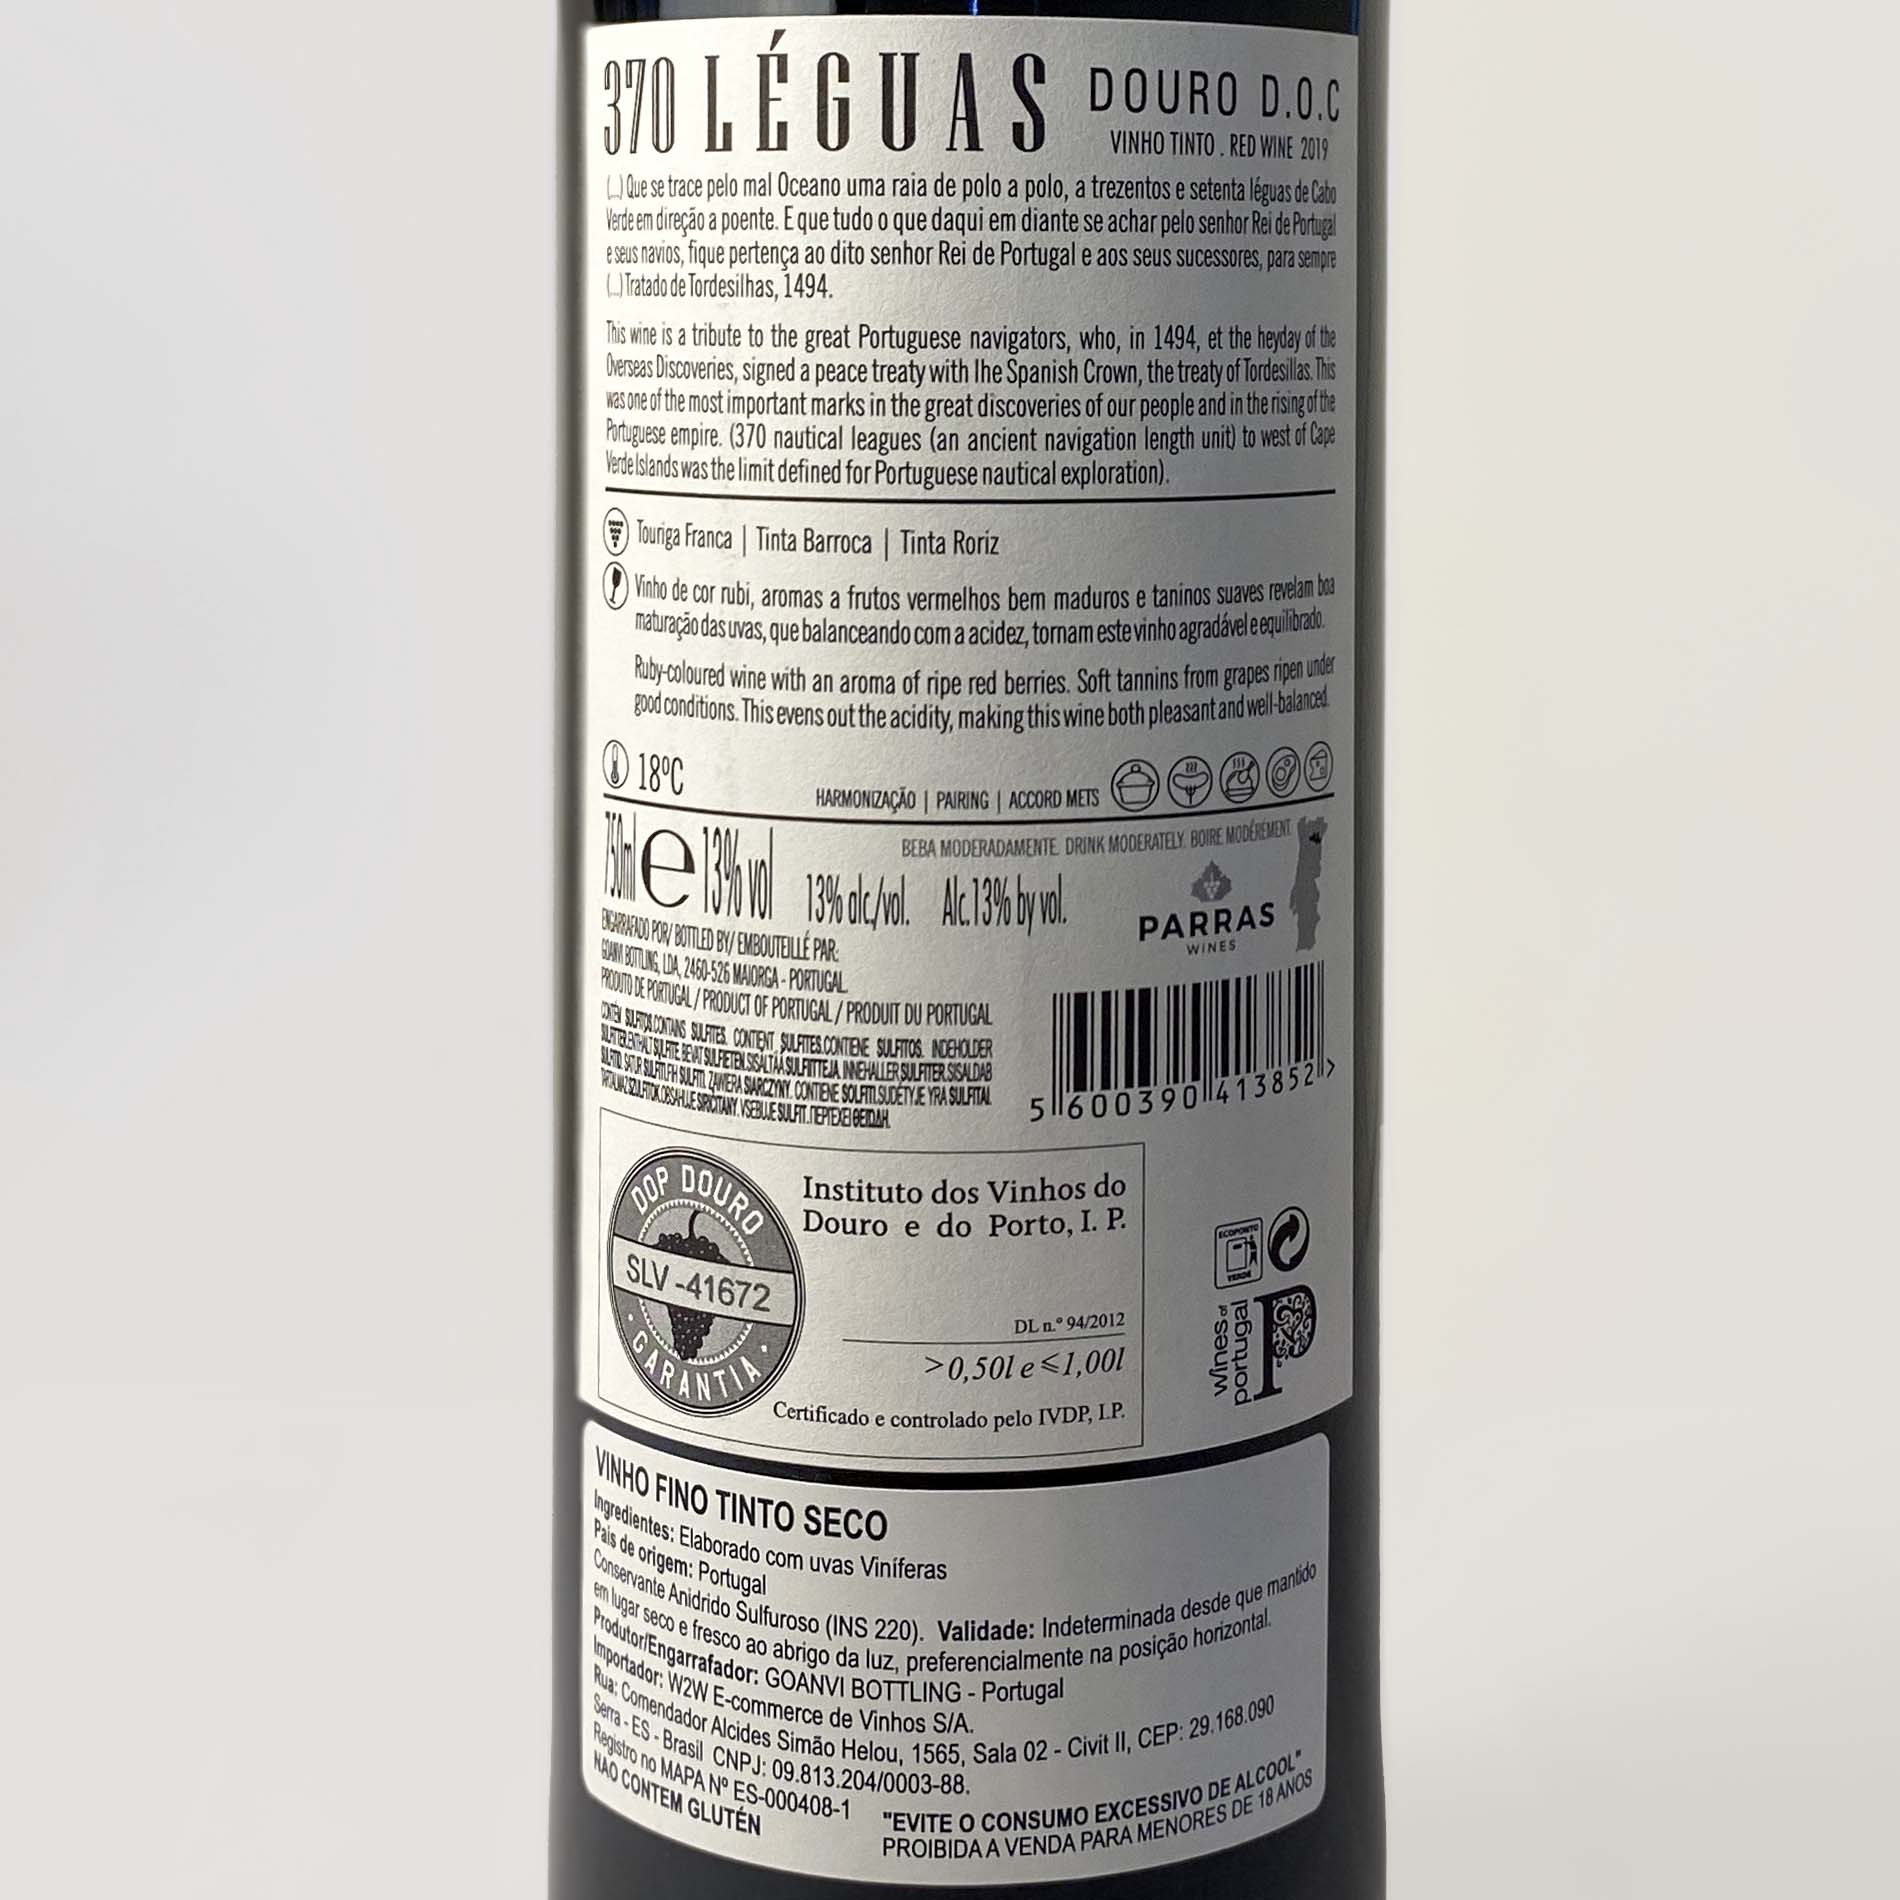 370 Leguas Doc Douro Tinto  - Vinerize